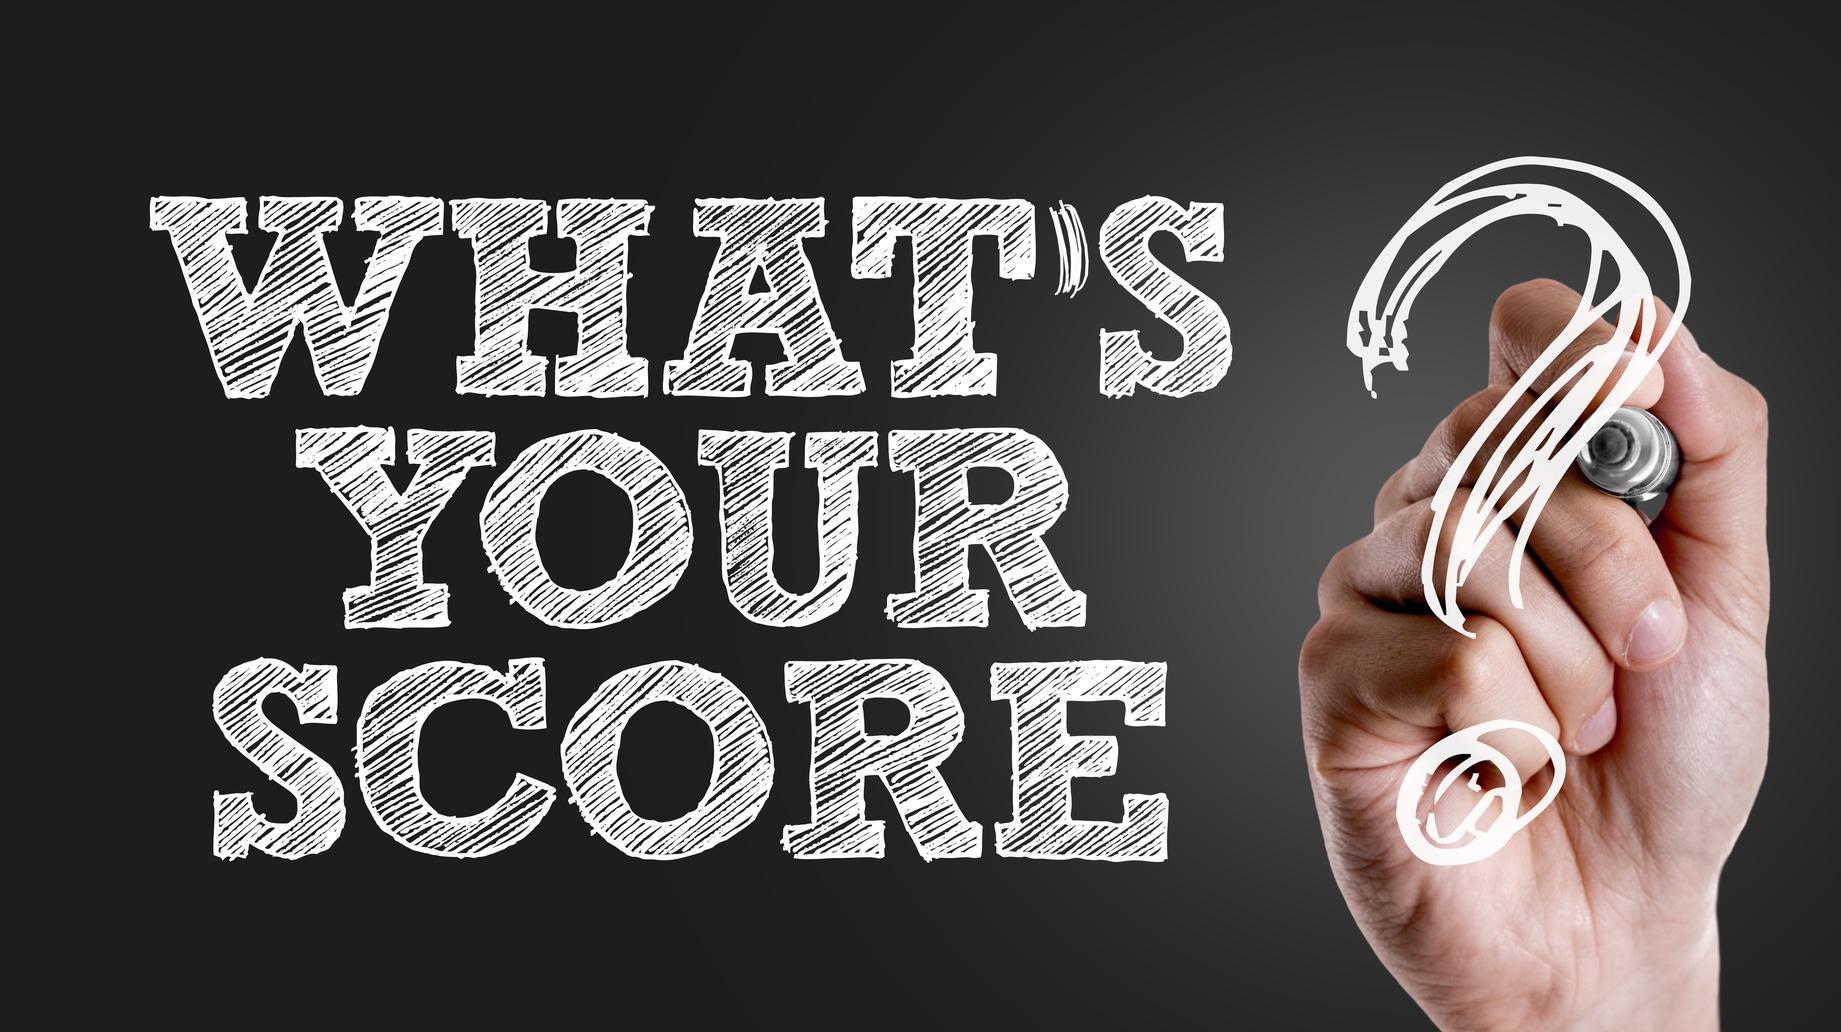 Type essays online buy college coursework sat essay score sat practice test score conversion tables sat tutor s blog domov geenschuldenfo Choice Image